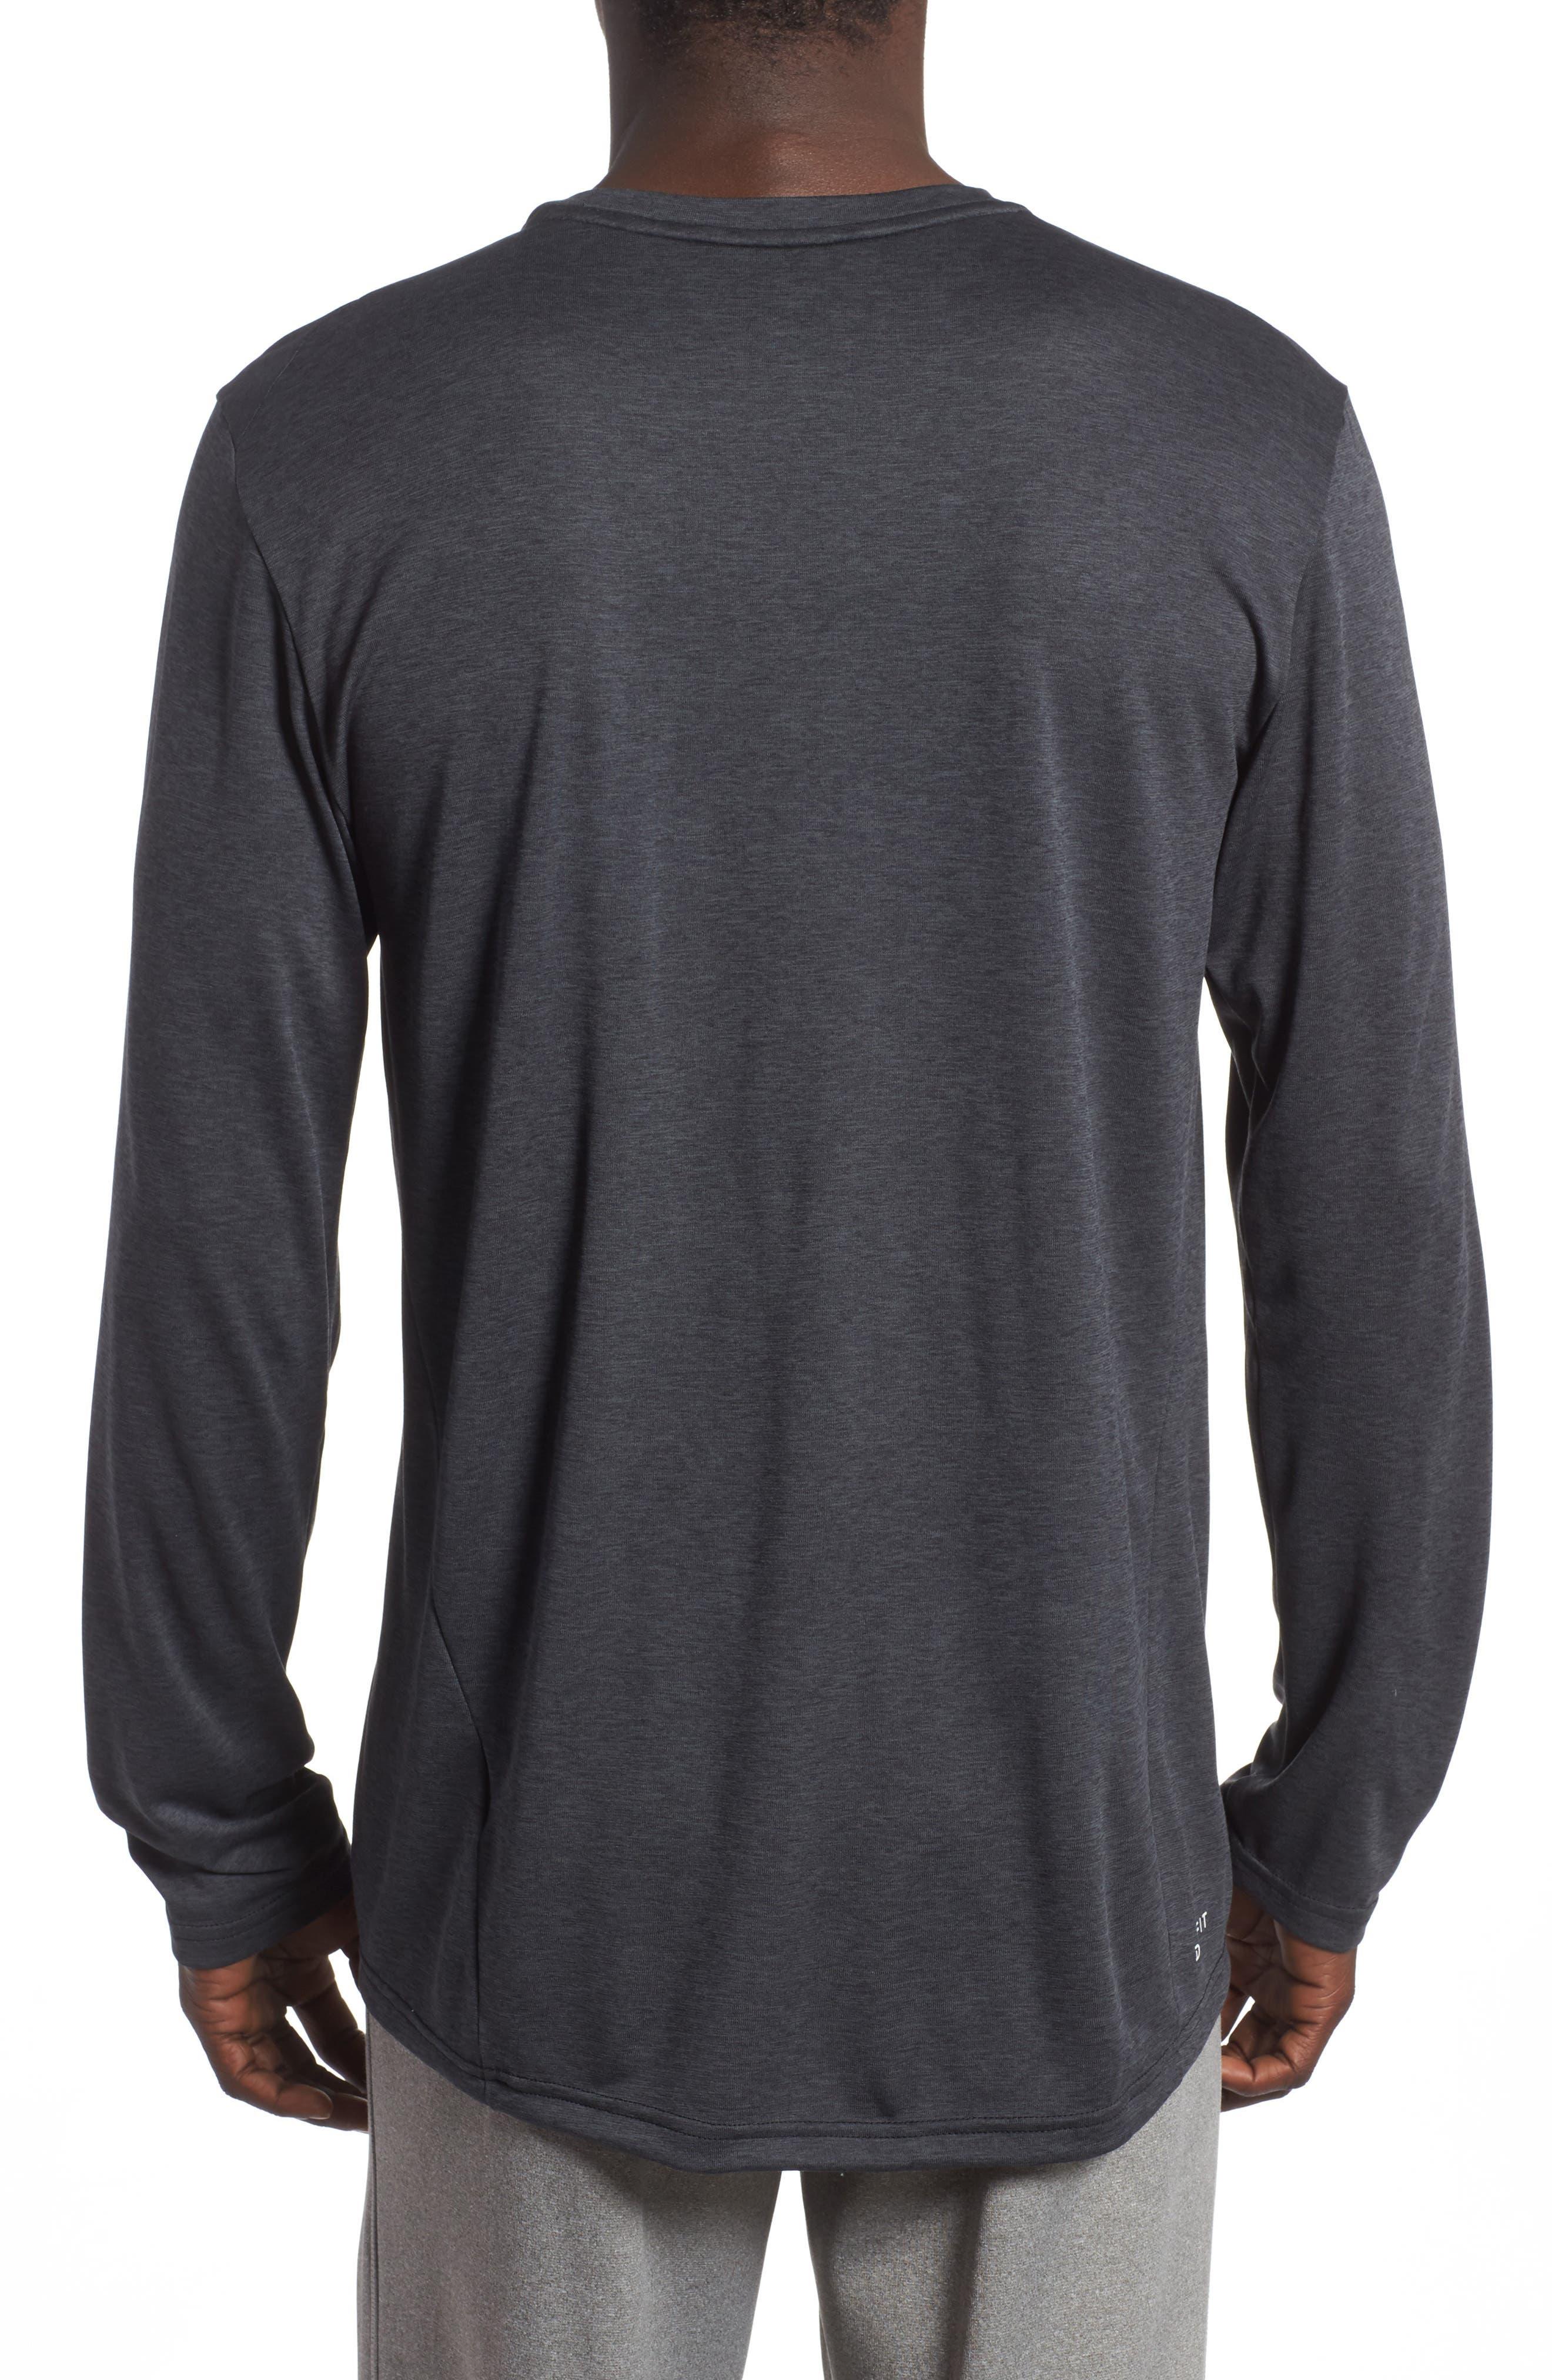 Long Sleeve Training T-Shirt,                             Alternate thumbnail 2, color,                             Black/ Anthracite/ Hematite